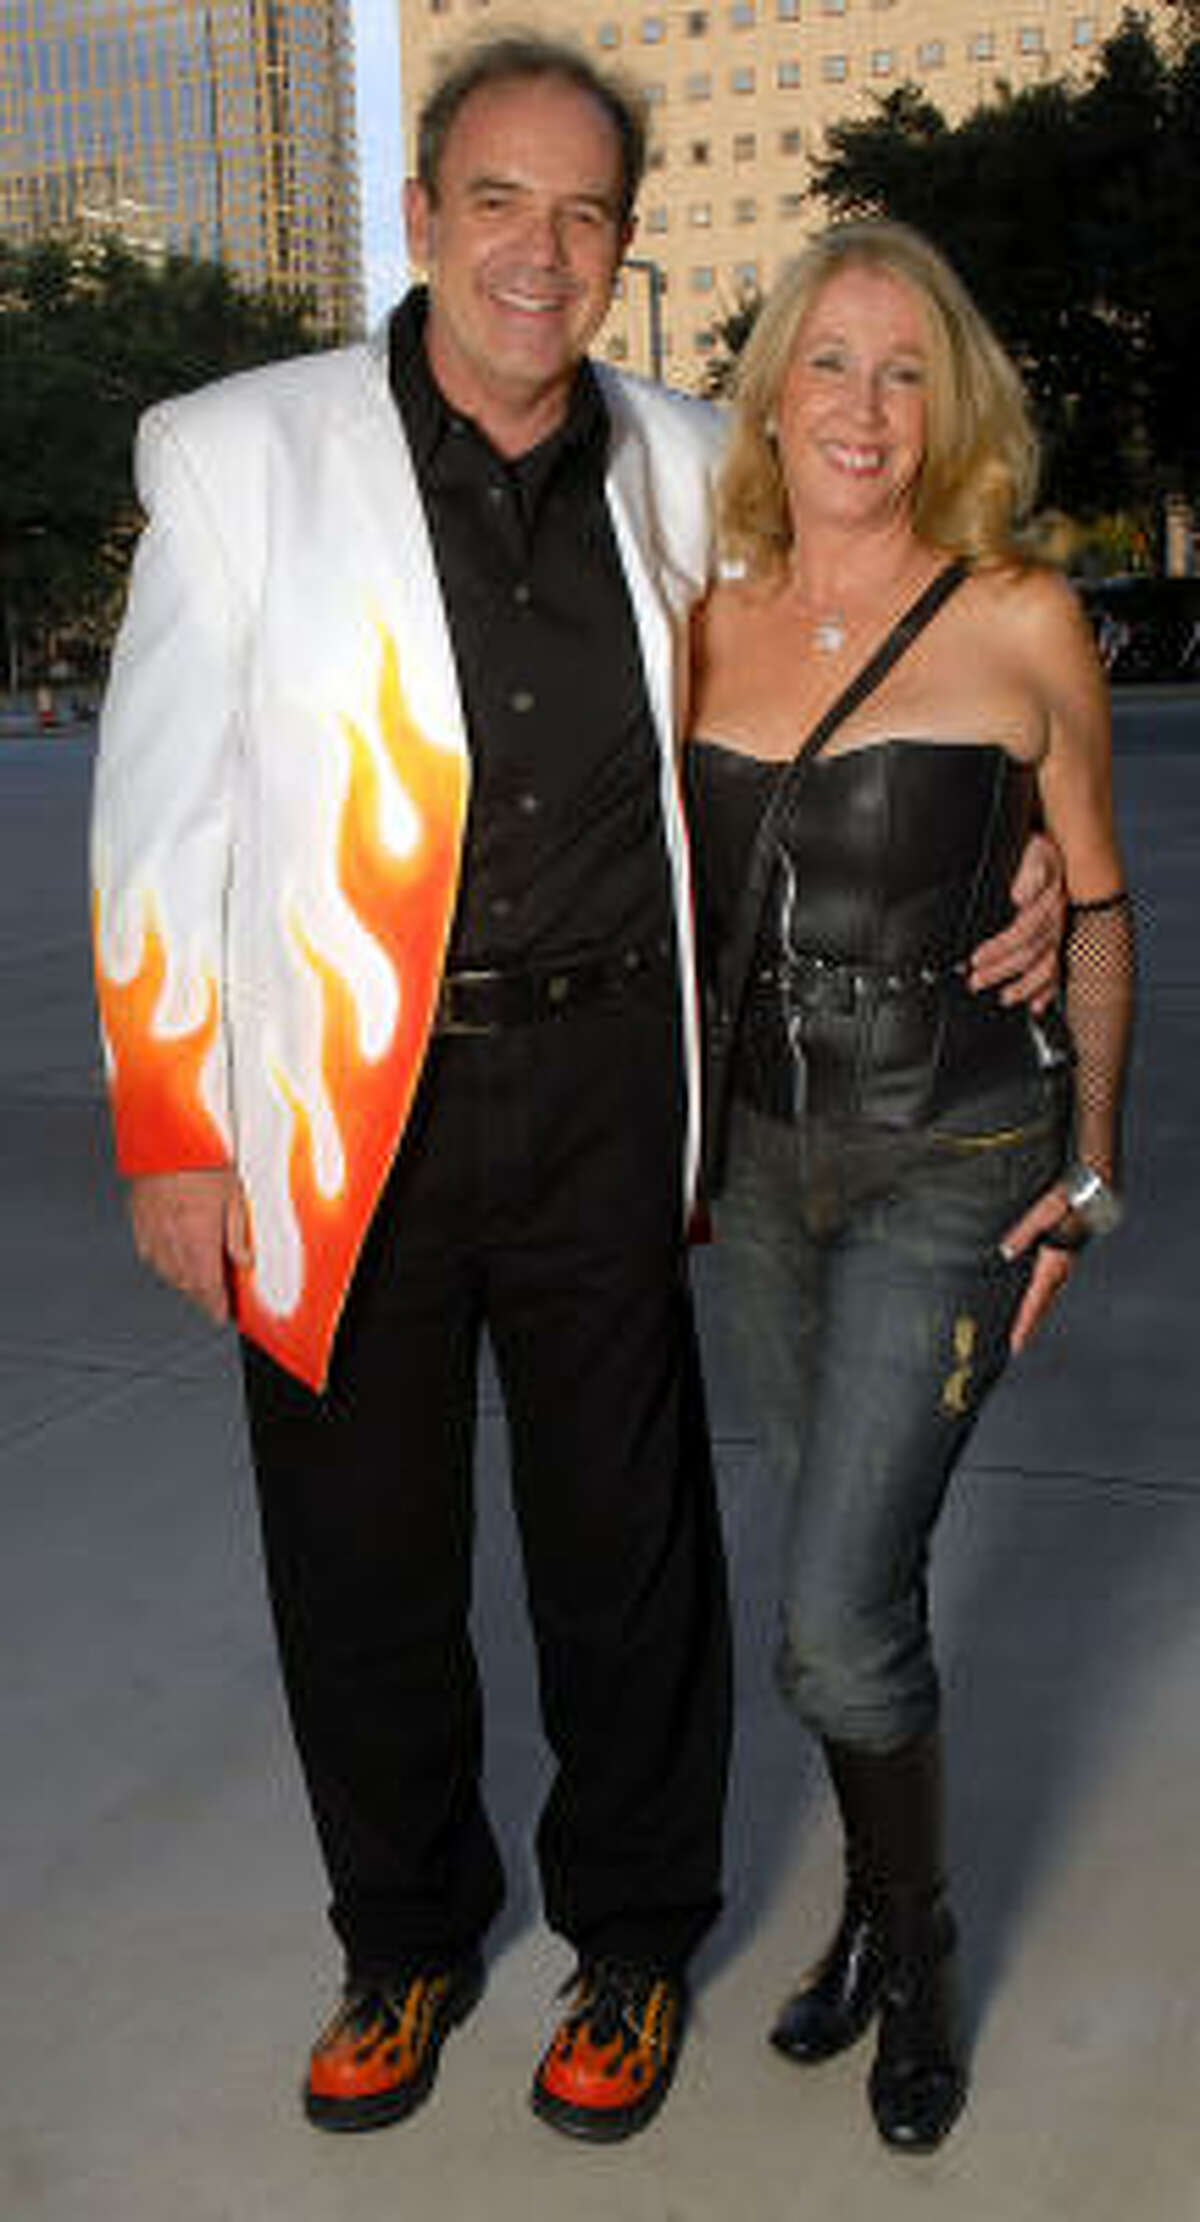 Bob Loiseau and Mary Jane Moran